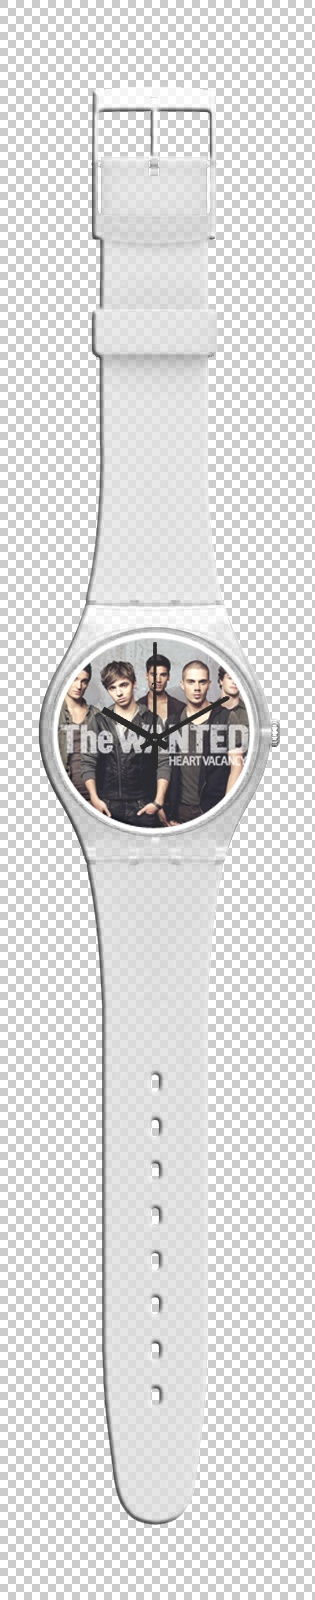 The Wanted Wrist Watch. IDR 85,000. Pilihan tali bisa dilihat di : http://pinterest.com/syfh/pilihan-tali-untuk-jam-tangan-wrist-watch/